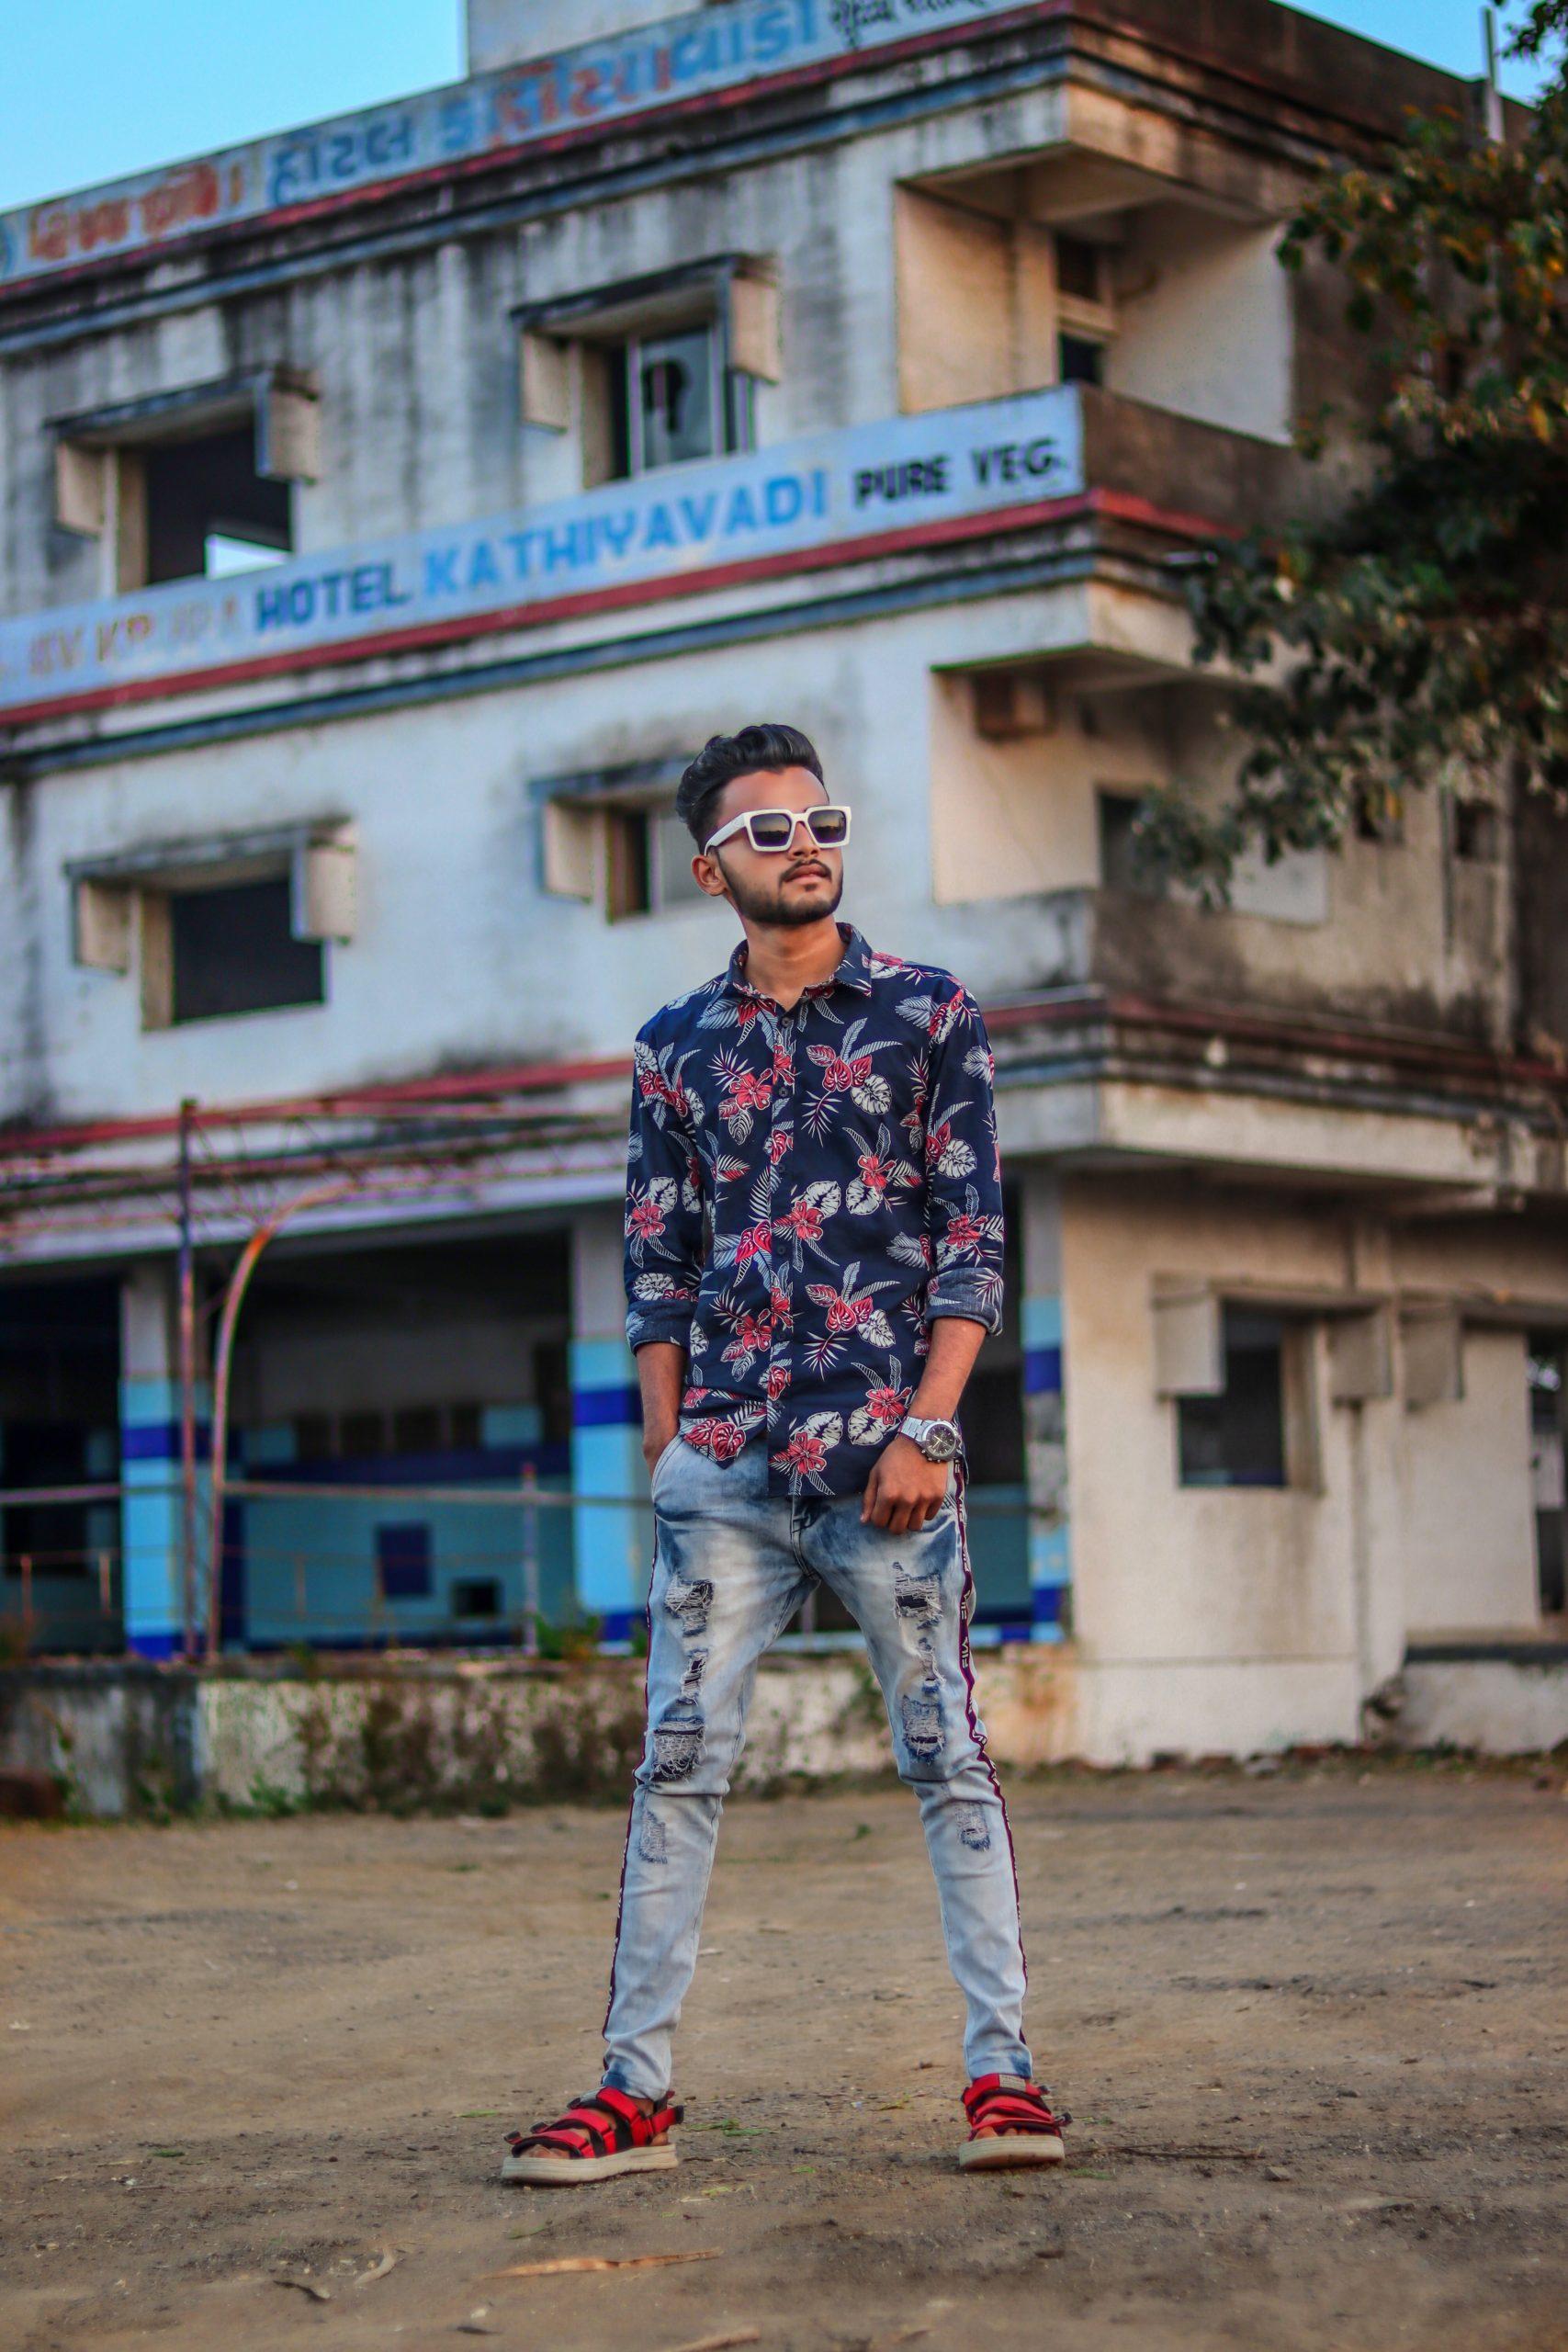 A boy near a building